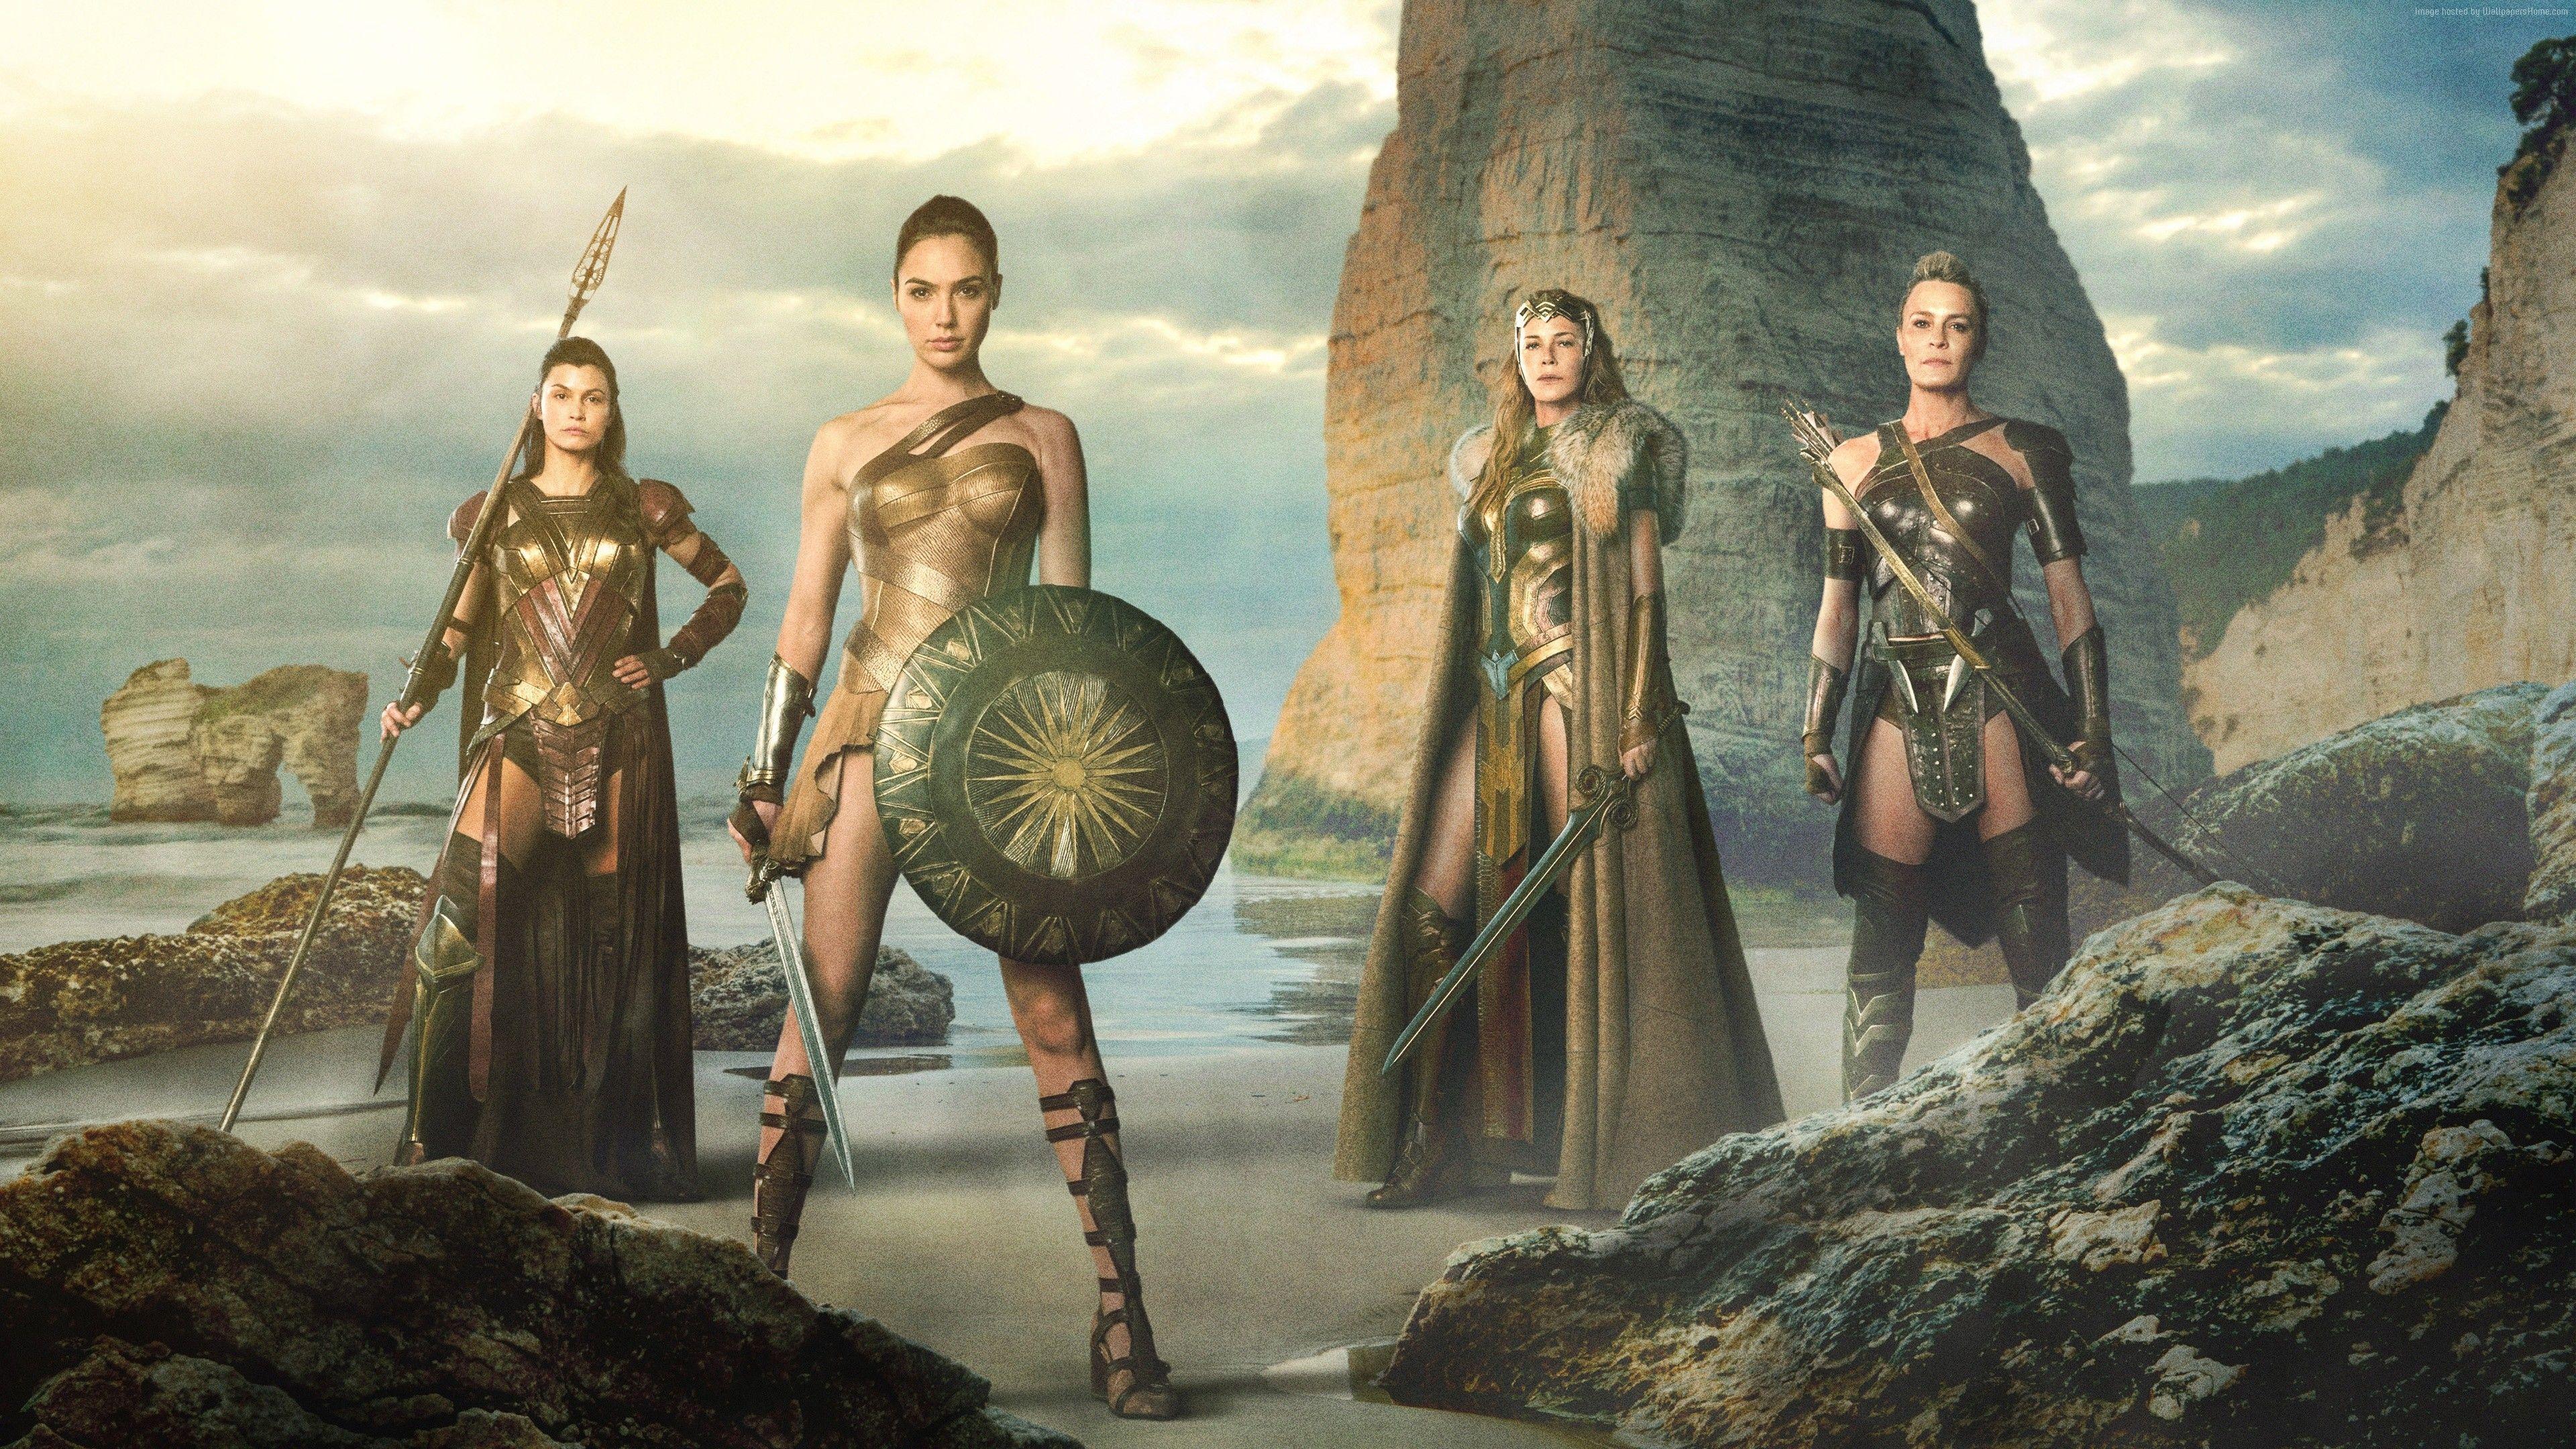 Wonder Woman Wallpaper, Movies: Wonder Woman, Gal Gadot, superhero ...